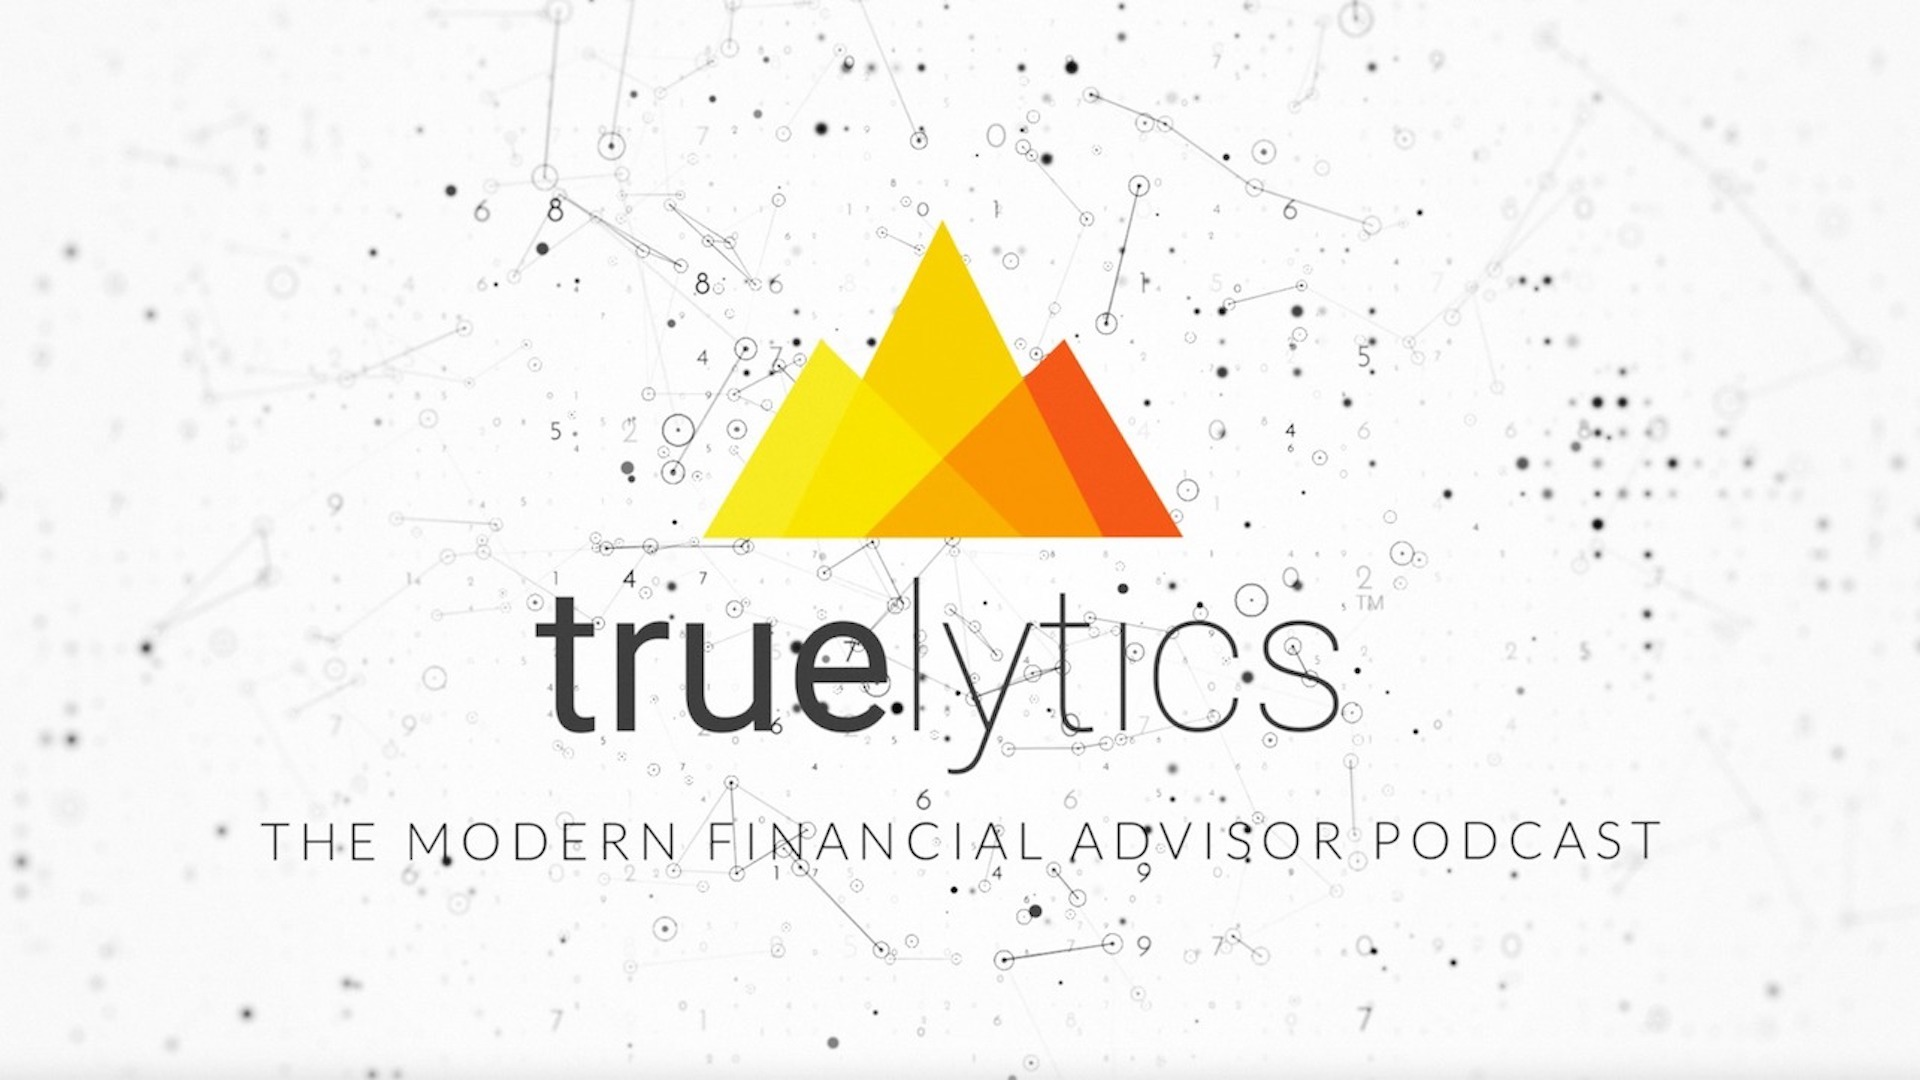 Episode 26 Video Update - Modern Financial Advisor